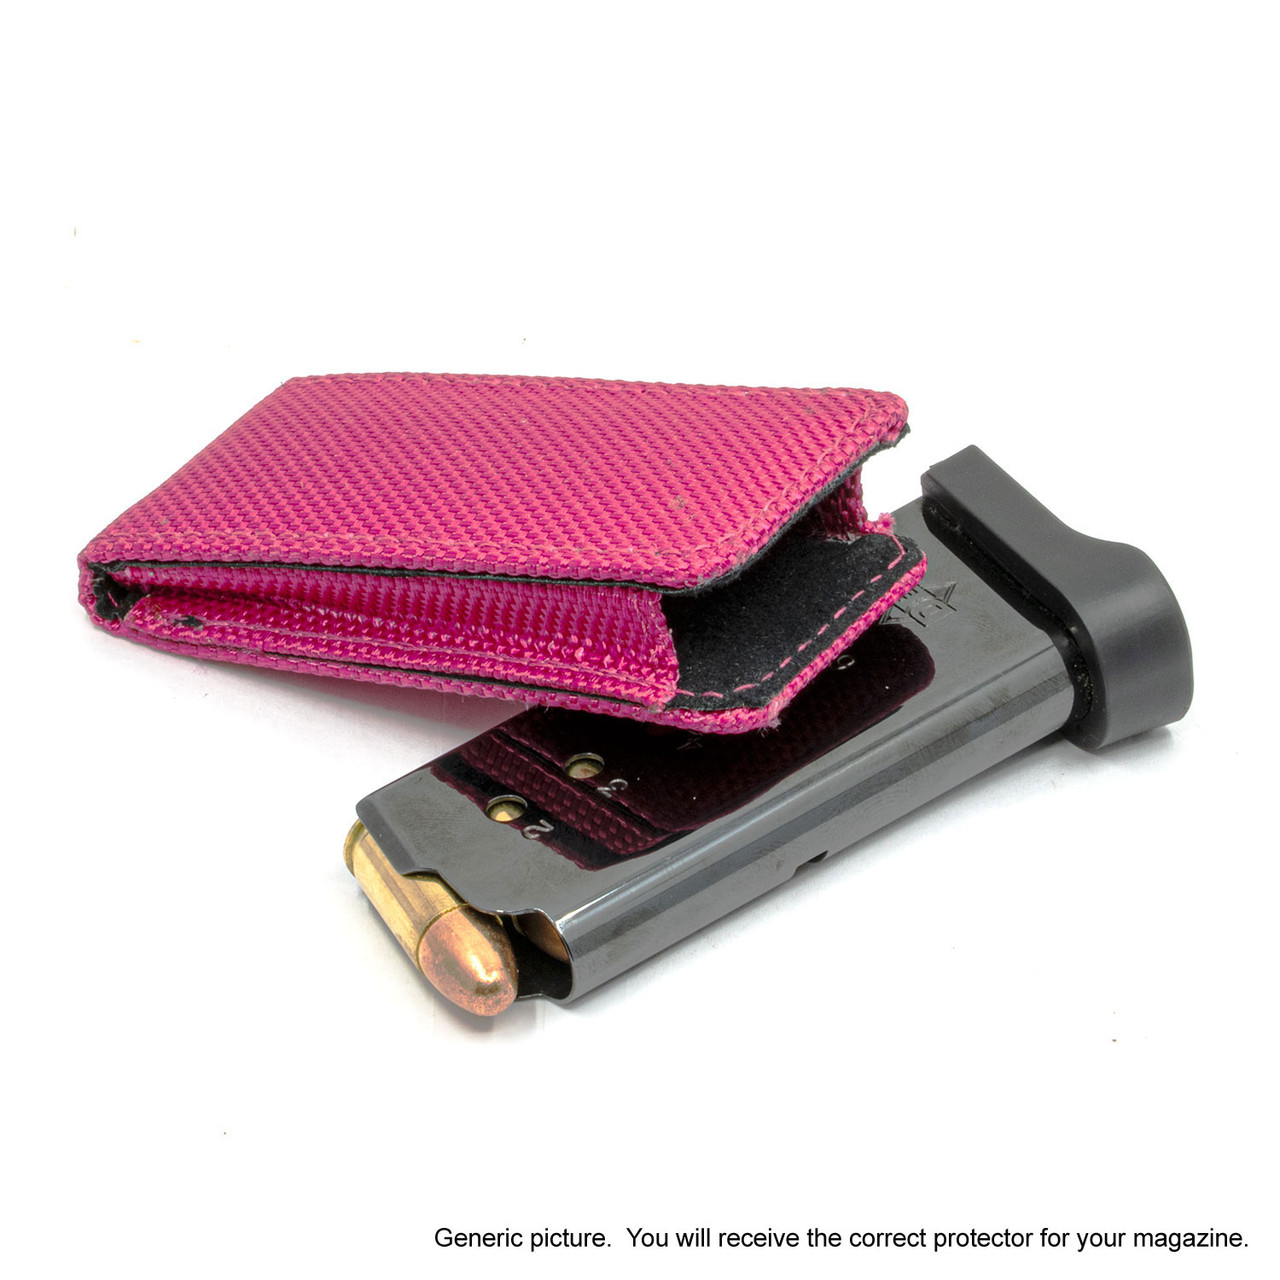 Glock 26 Pink Covert Magazine Pocket Protector